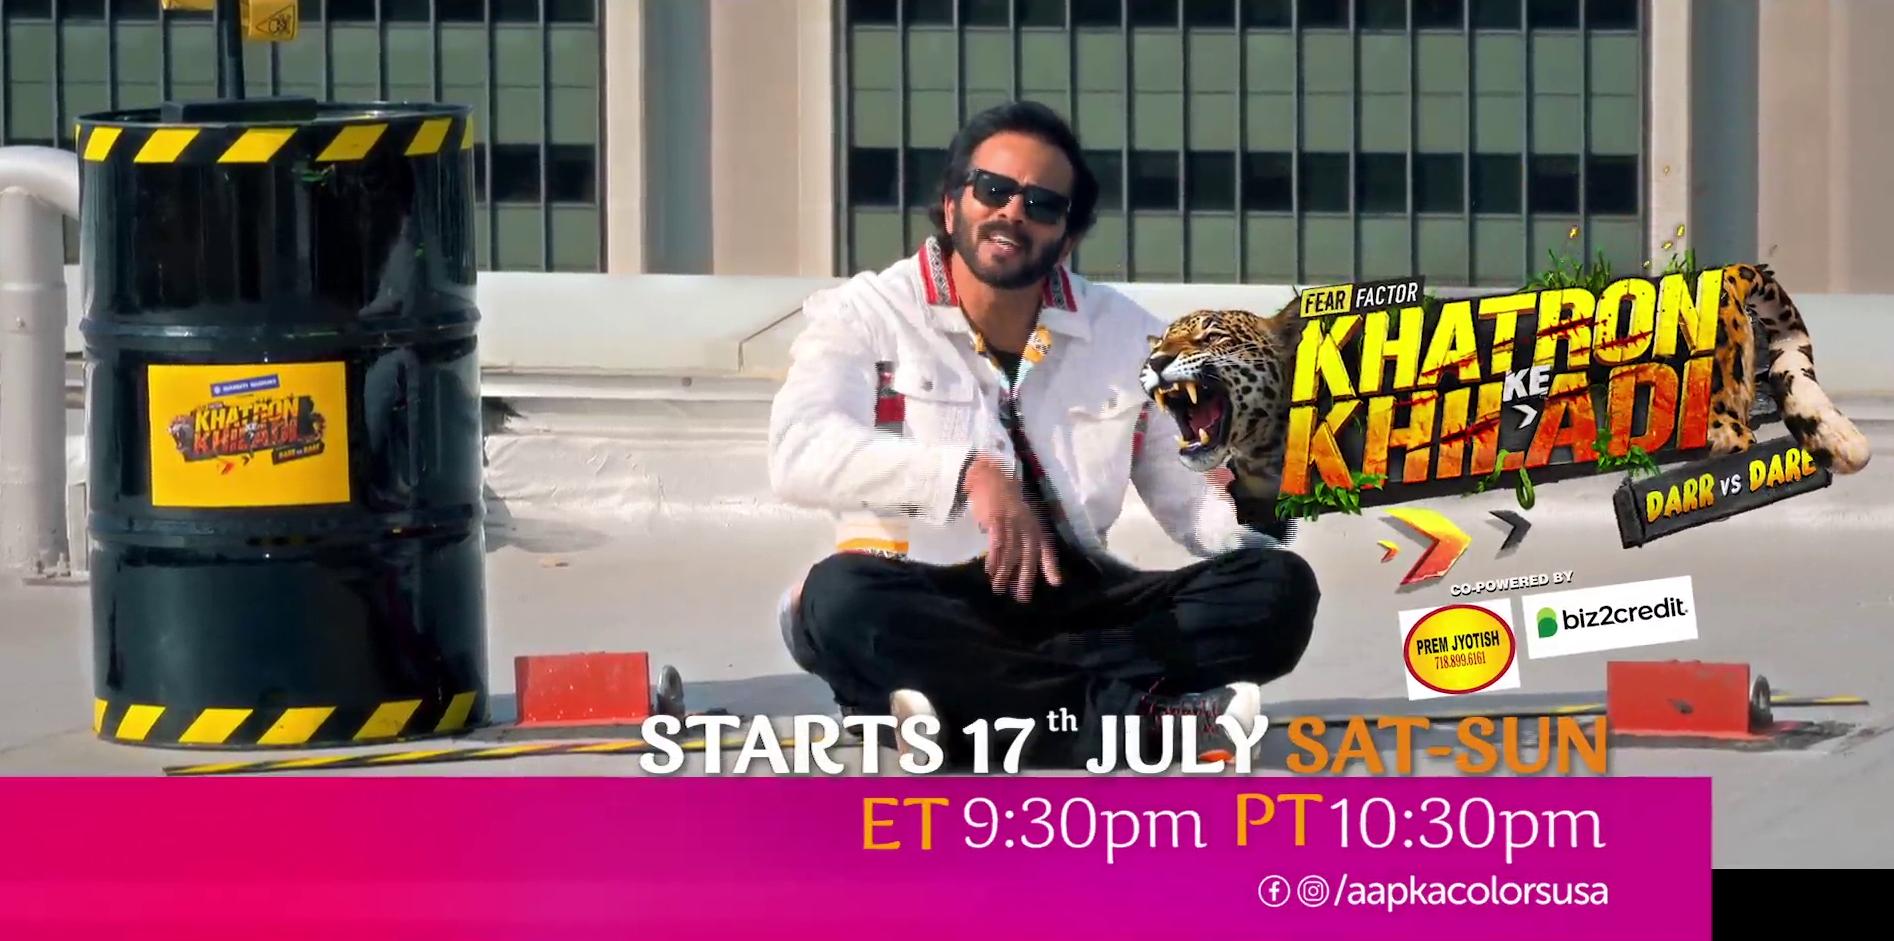 Khatron Ke Khiladi 11, Starts 17th July Sat-Sun ET 9:30pm PT 10:30pm on Aapka Colors